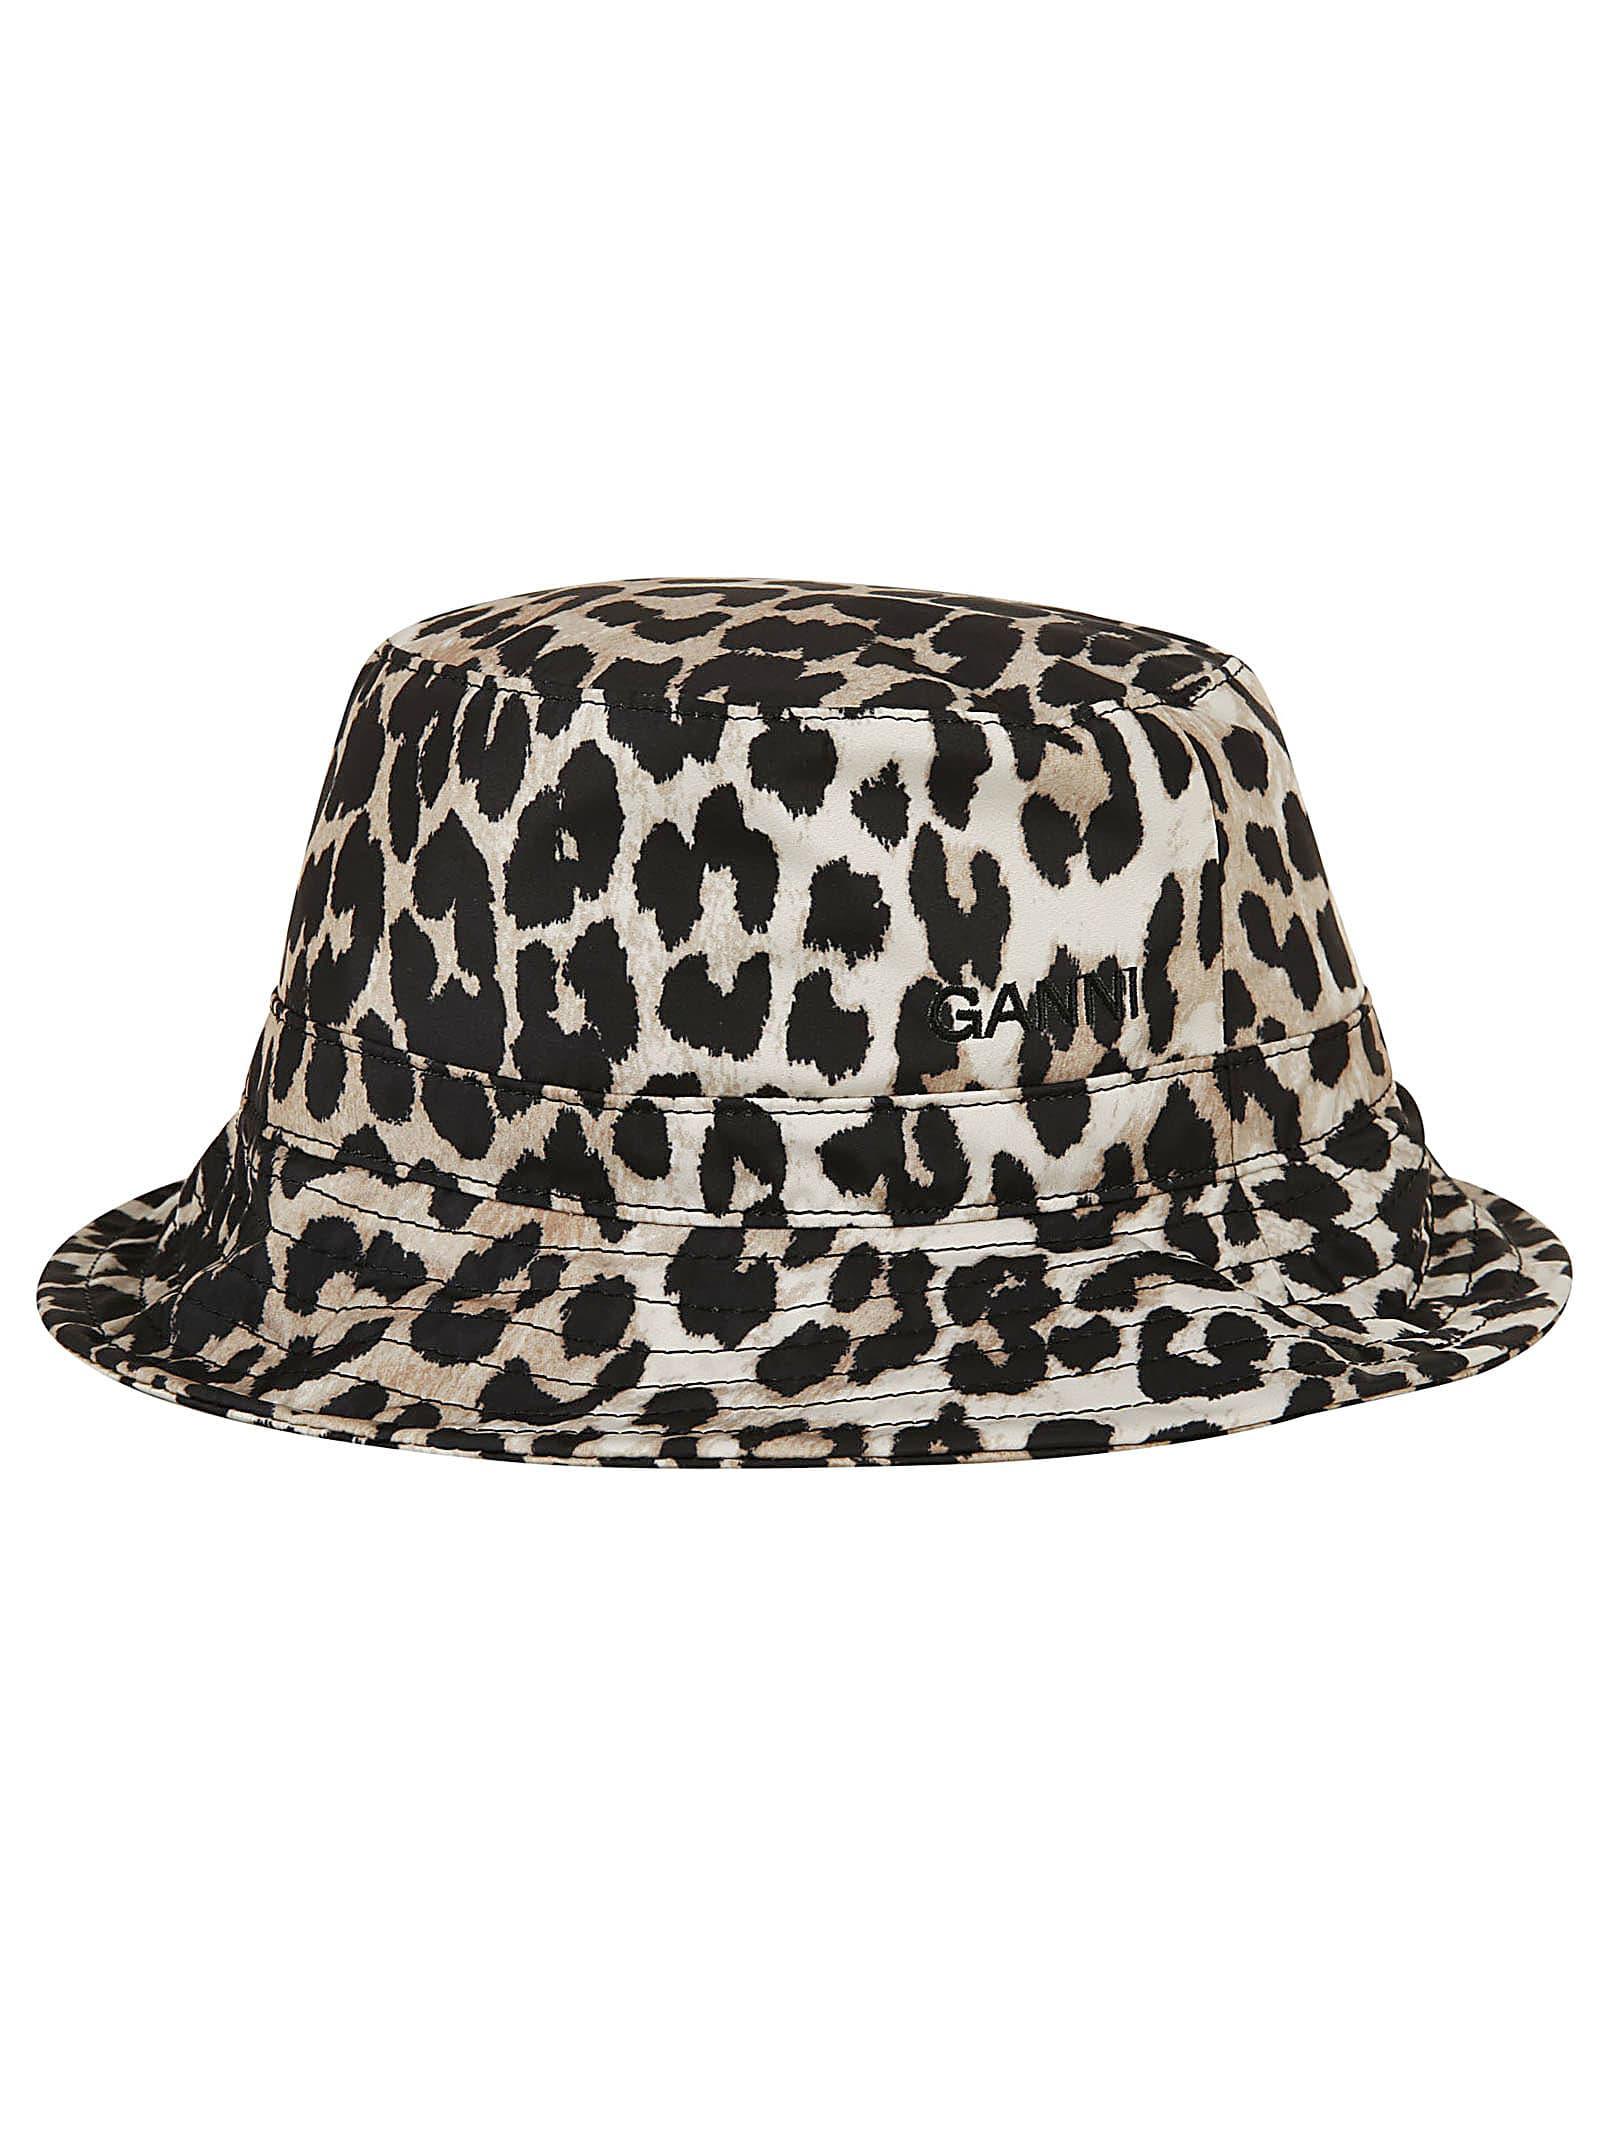 Ganni Hats SEASONAL RECYCLED TECH